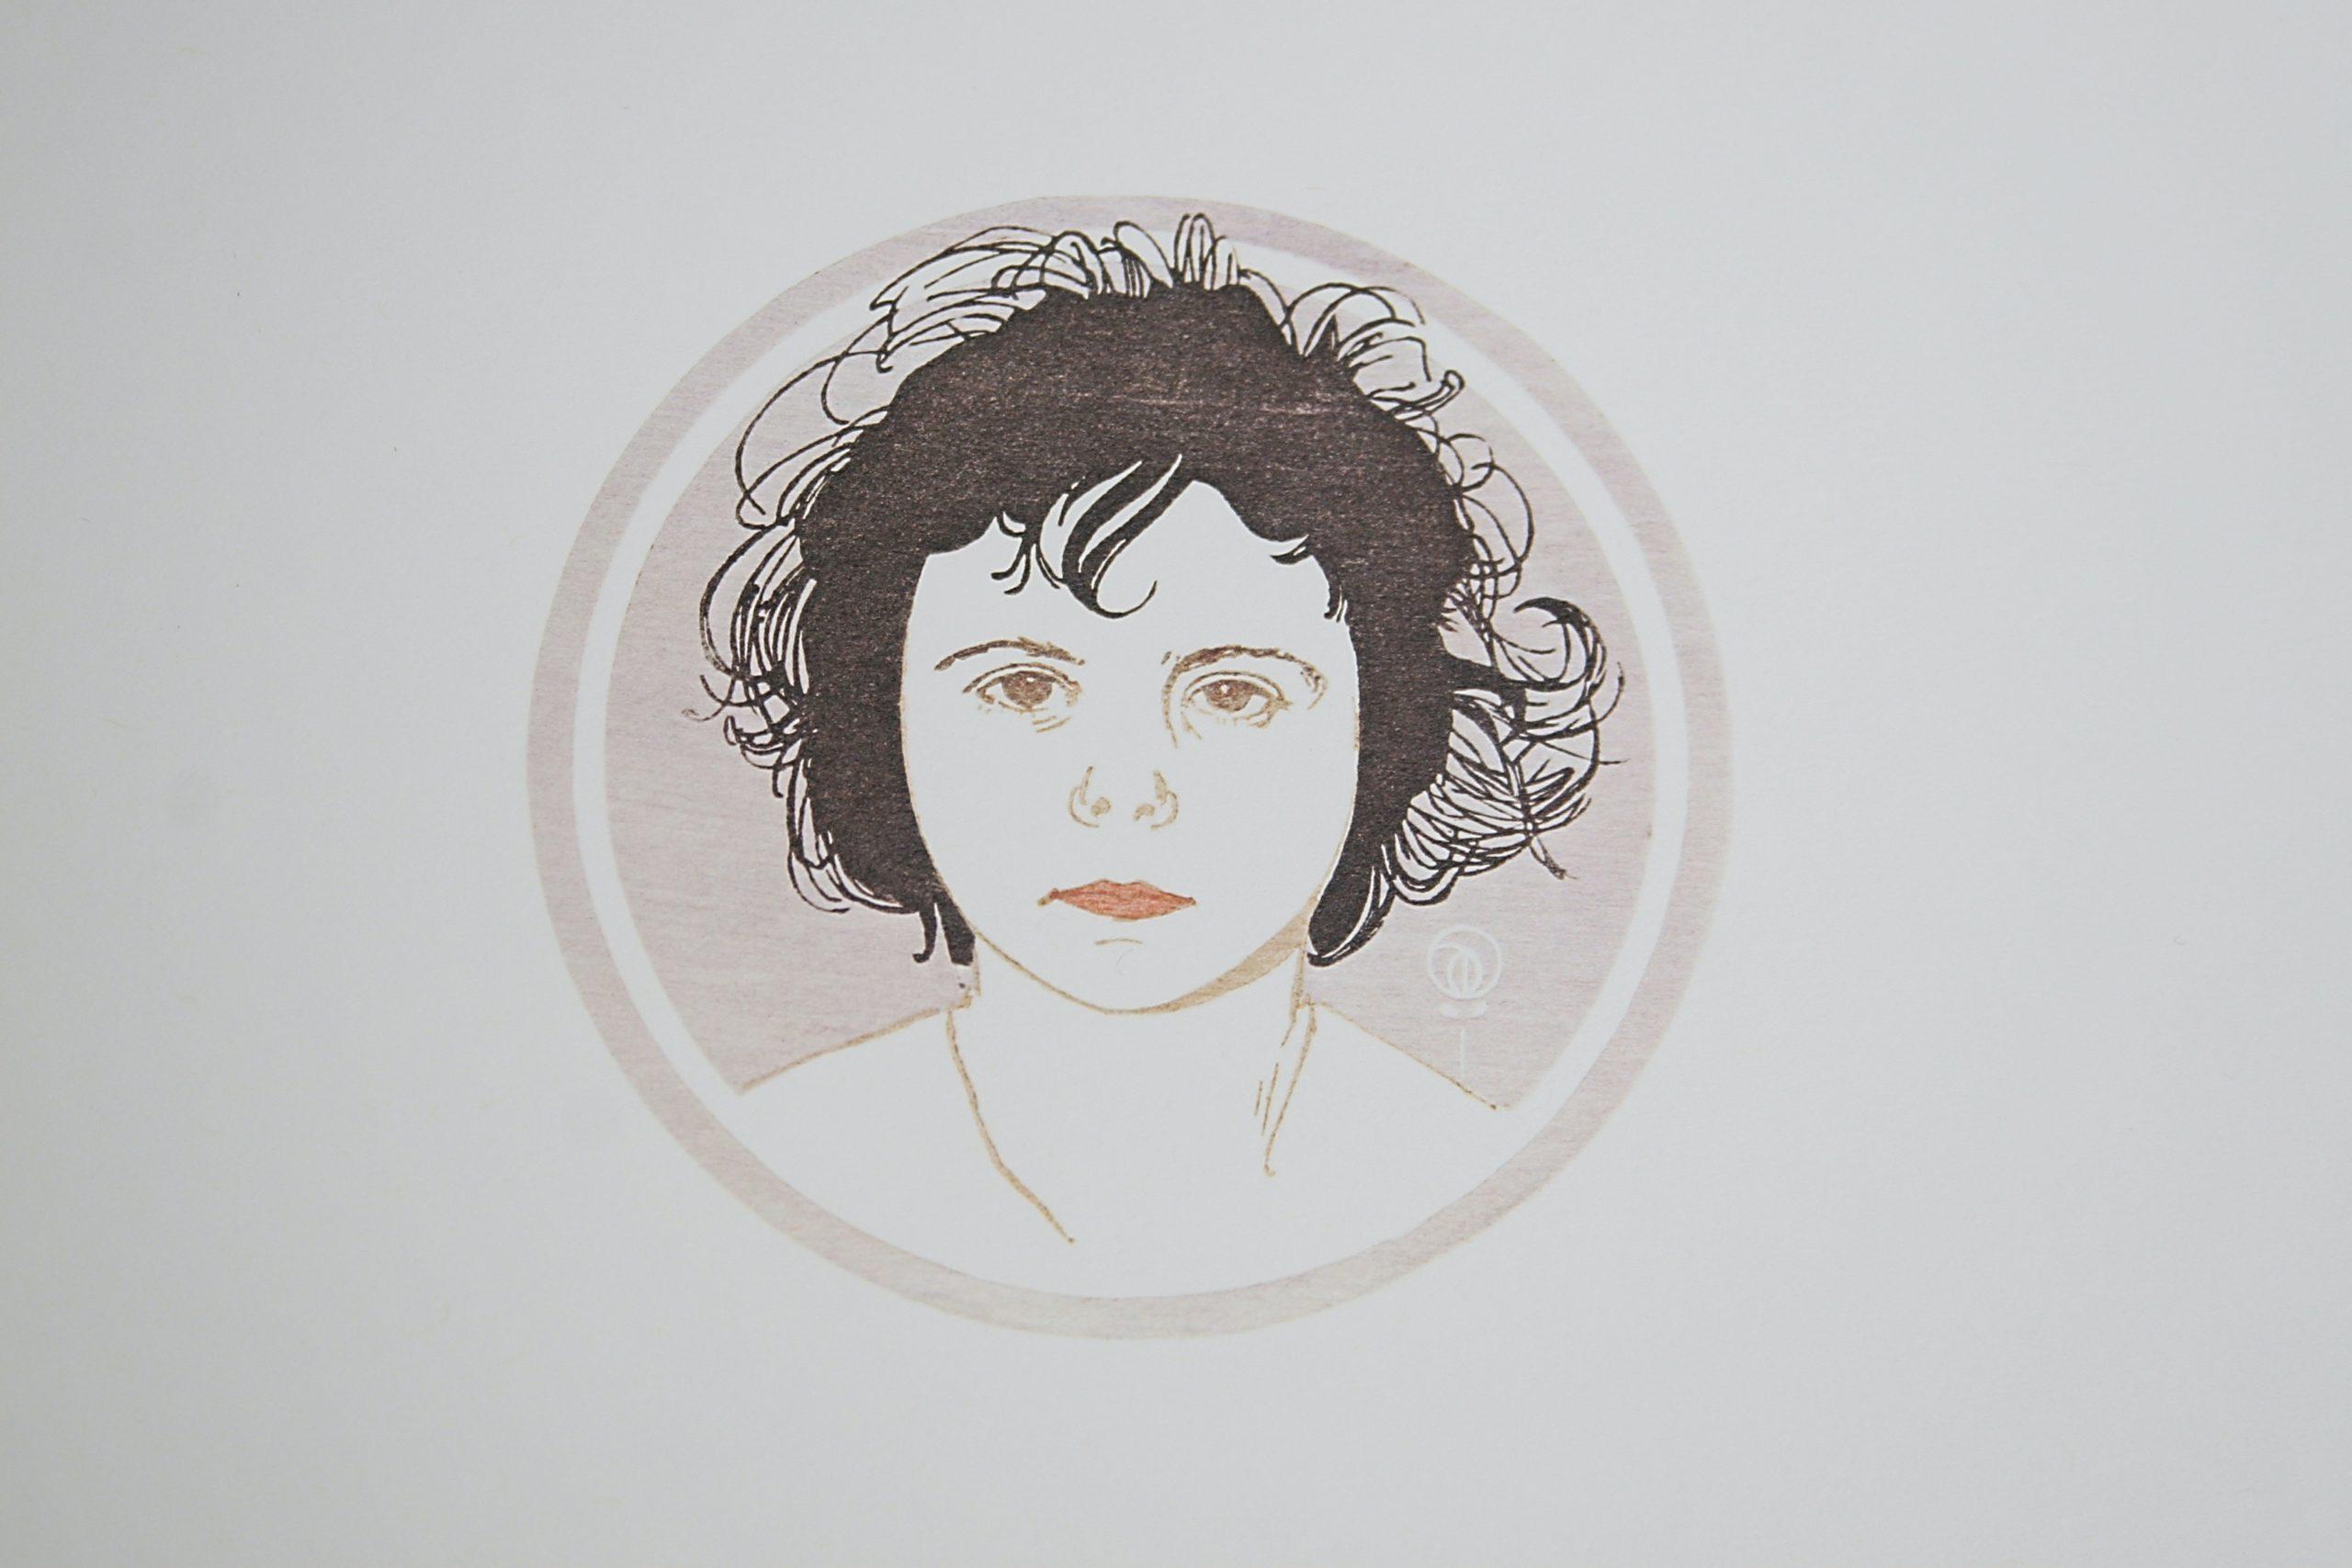 Margaret by WJ Phillips